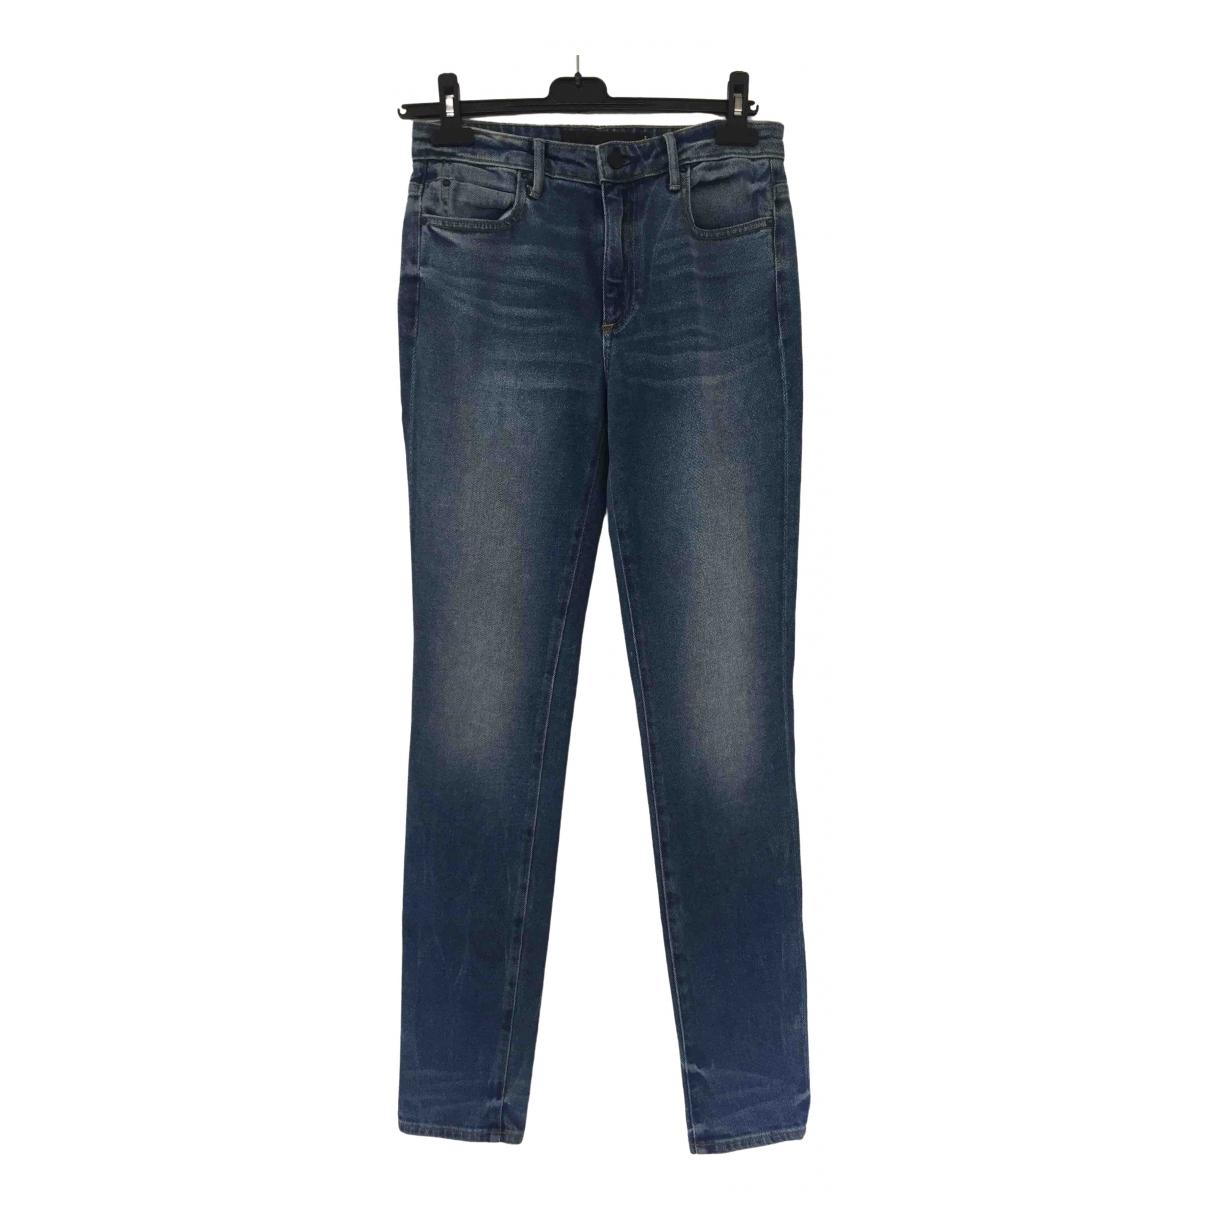 Alexander Wang \N Blue Cotton - elasthane Jeans for Women 27 US